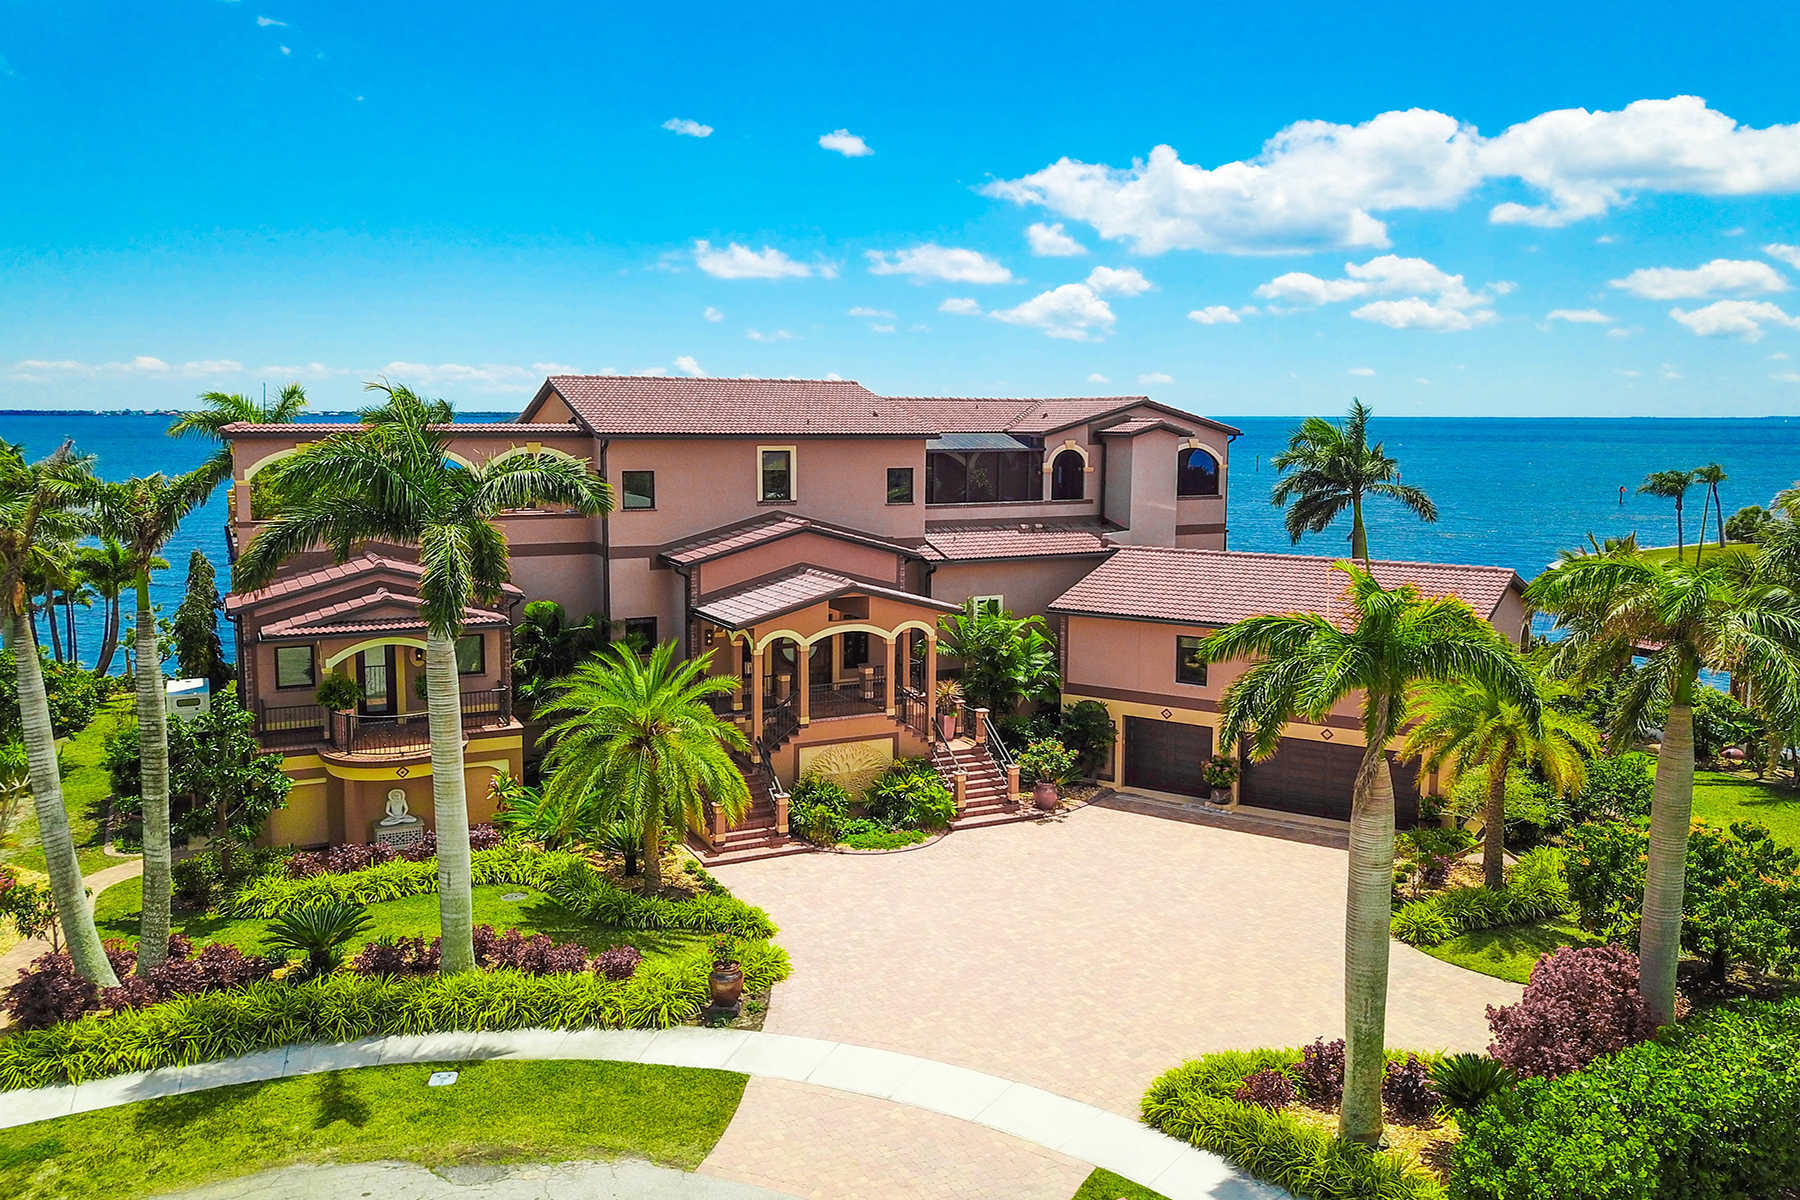 Single Family Homes for Sale at PORT CHARLOTTE 266 Bangsberg Rd Se Port Charlotte, Florida 33952 United States